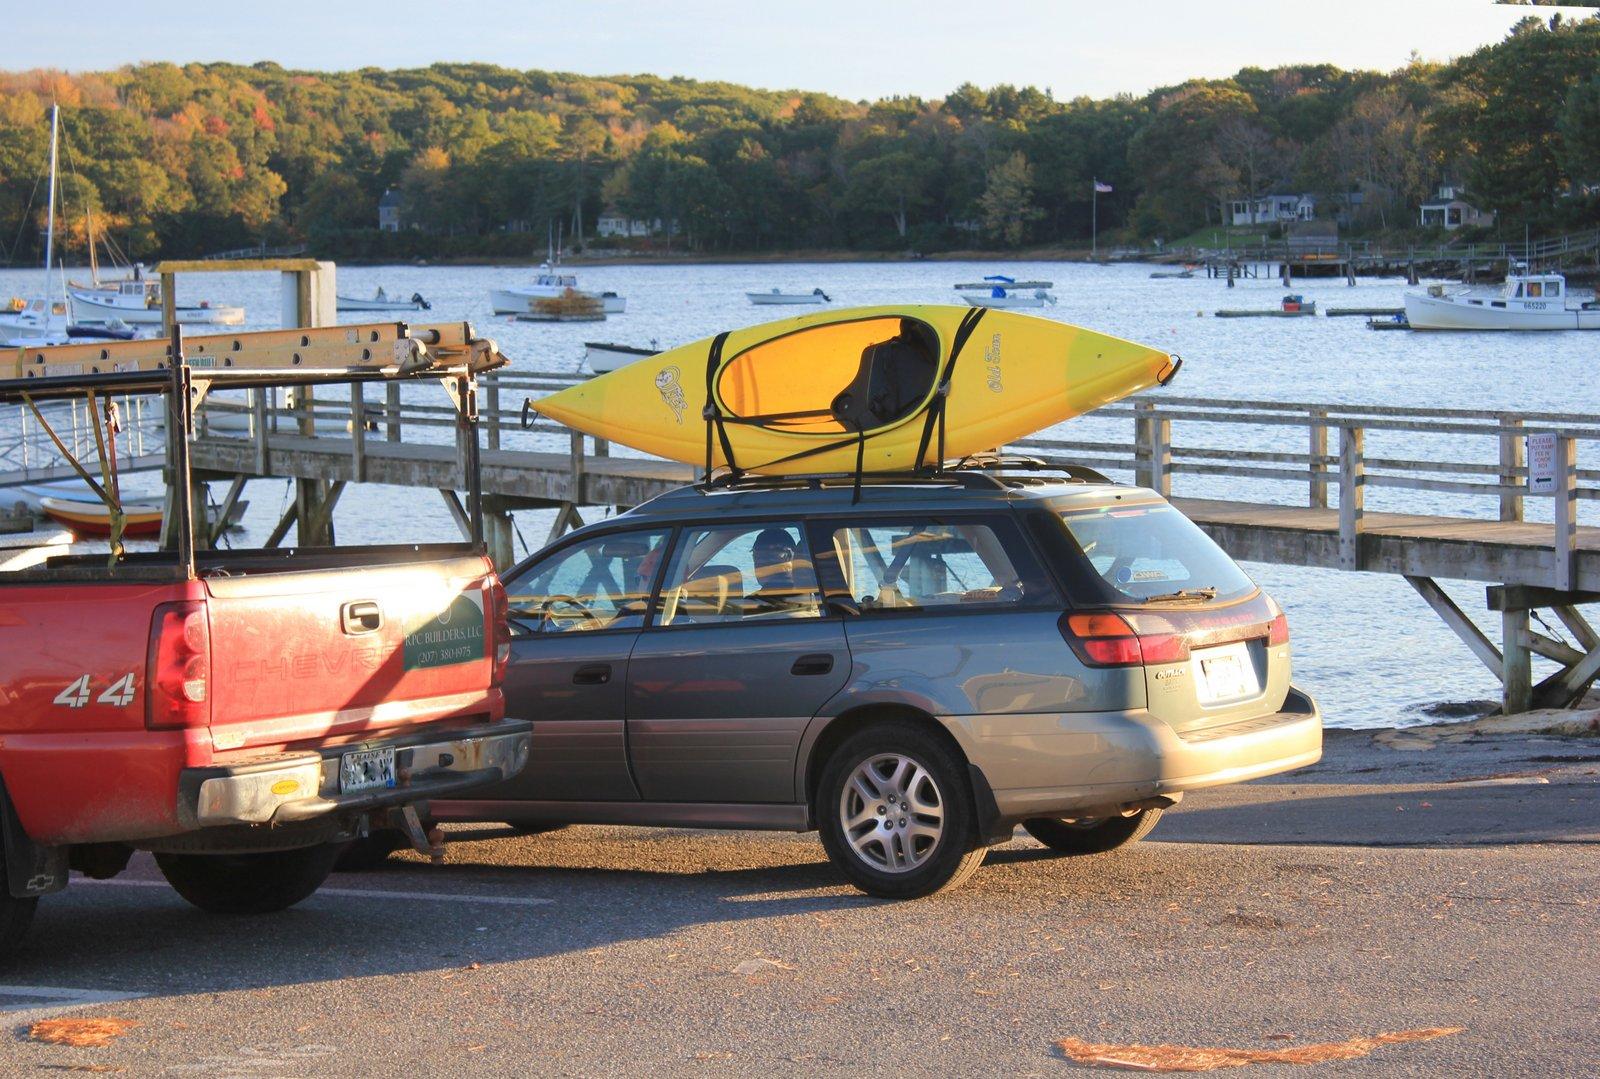 Preppy Cars: Salt Water New England: Salt Water New England On Cars